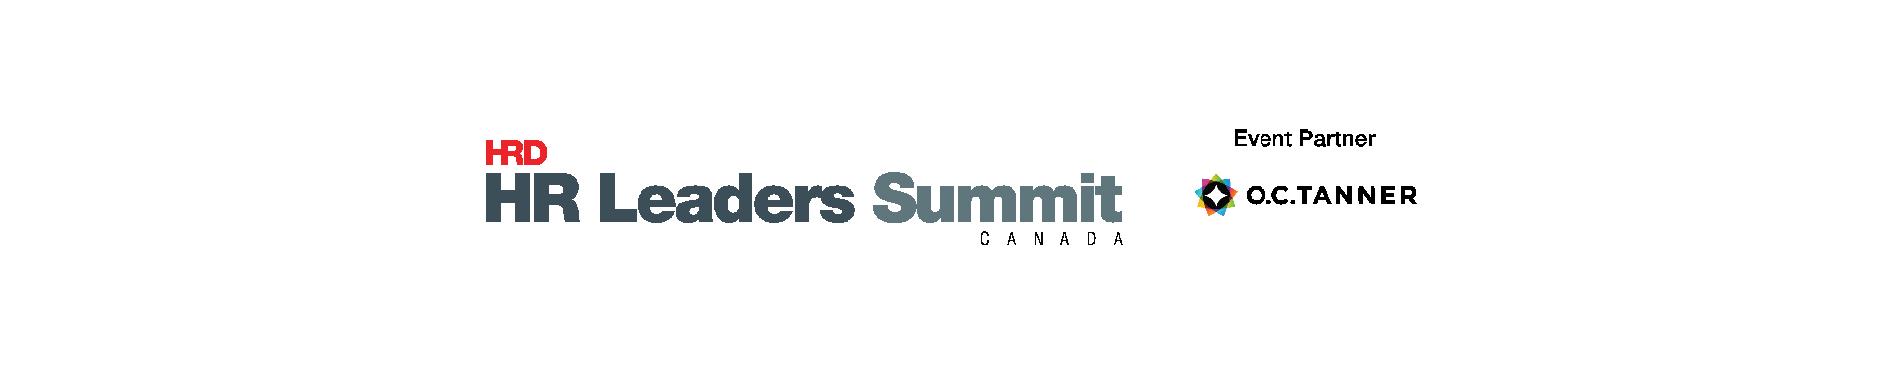 HR Leaders Summit Canada